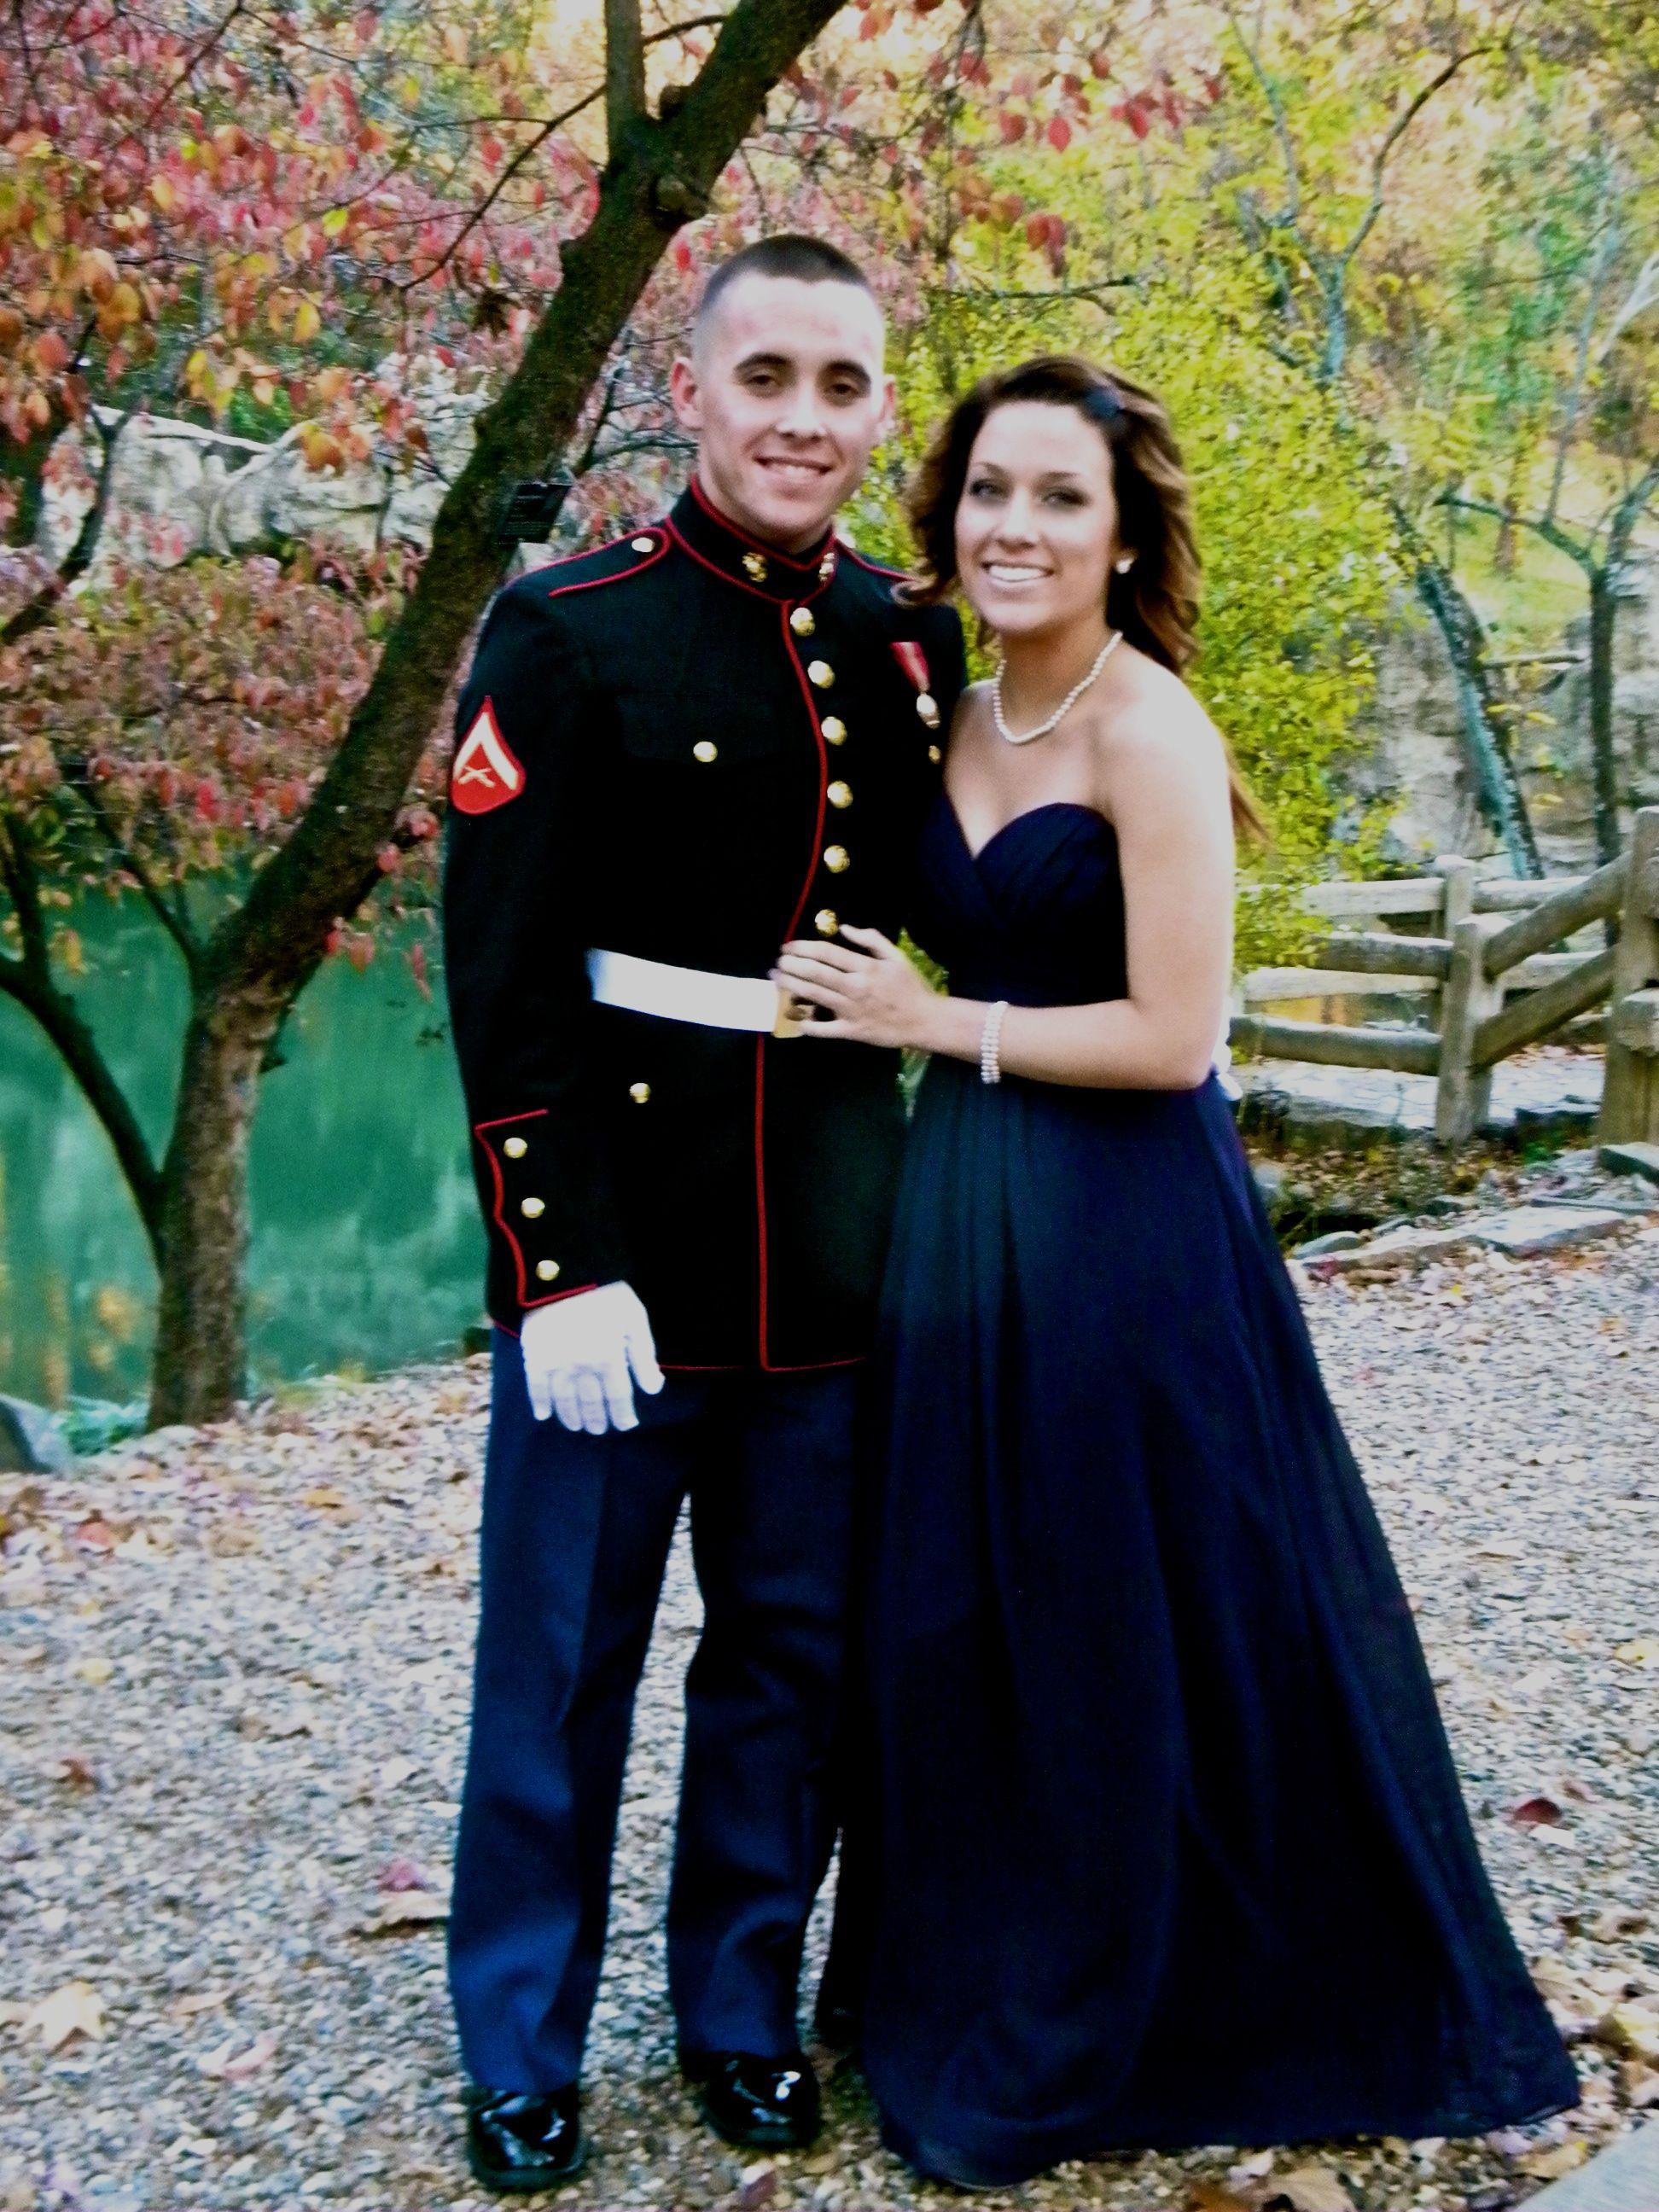 Marine Corps Birthday Ball Military ball dresses